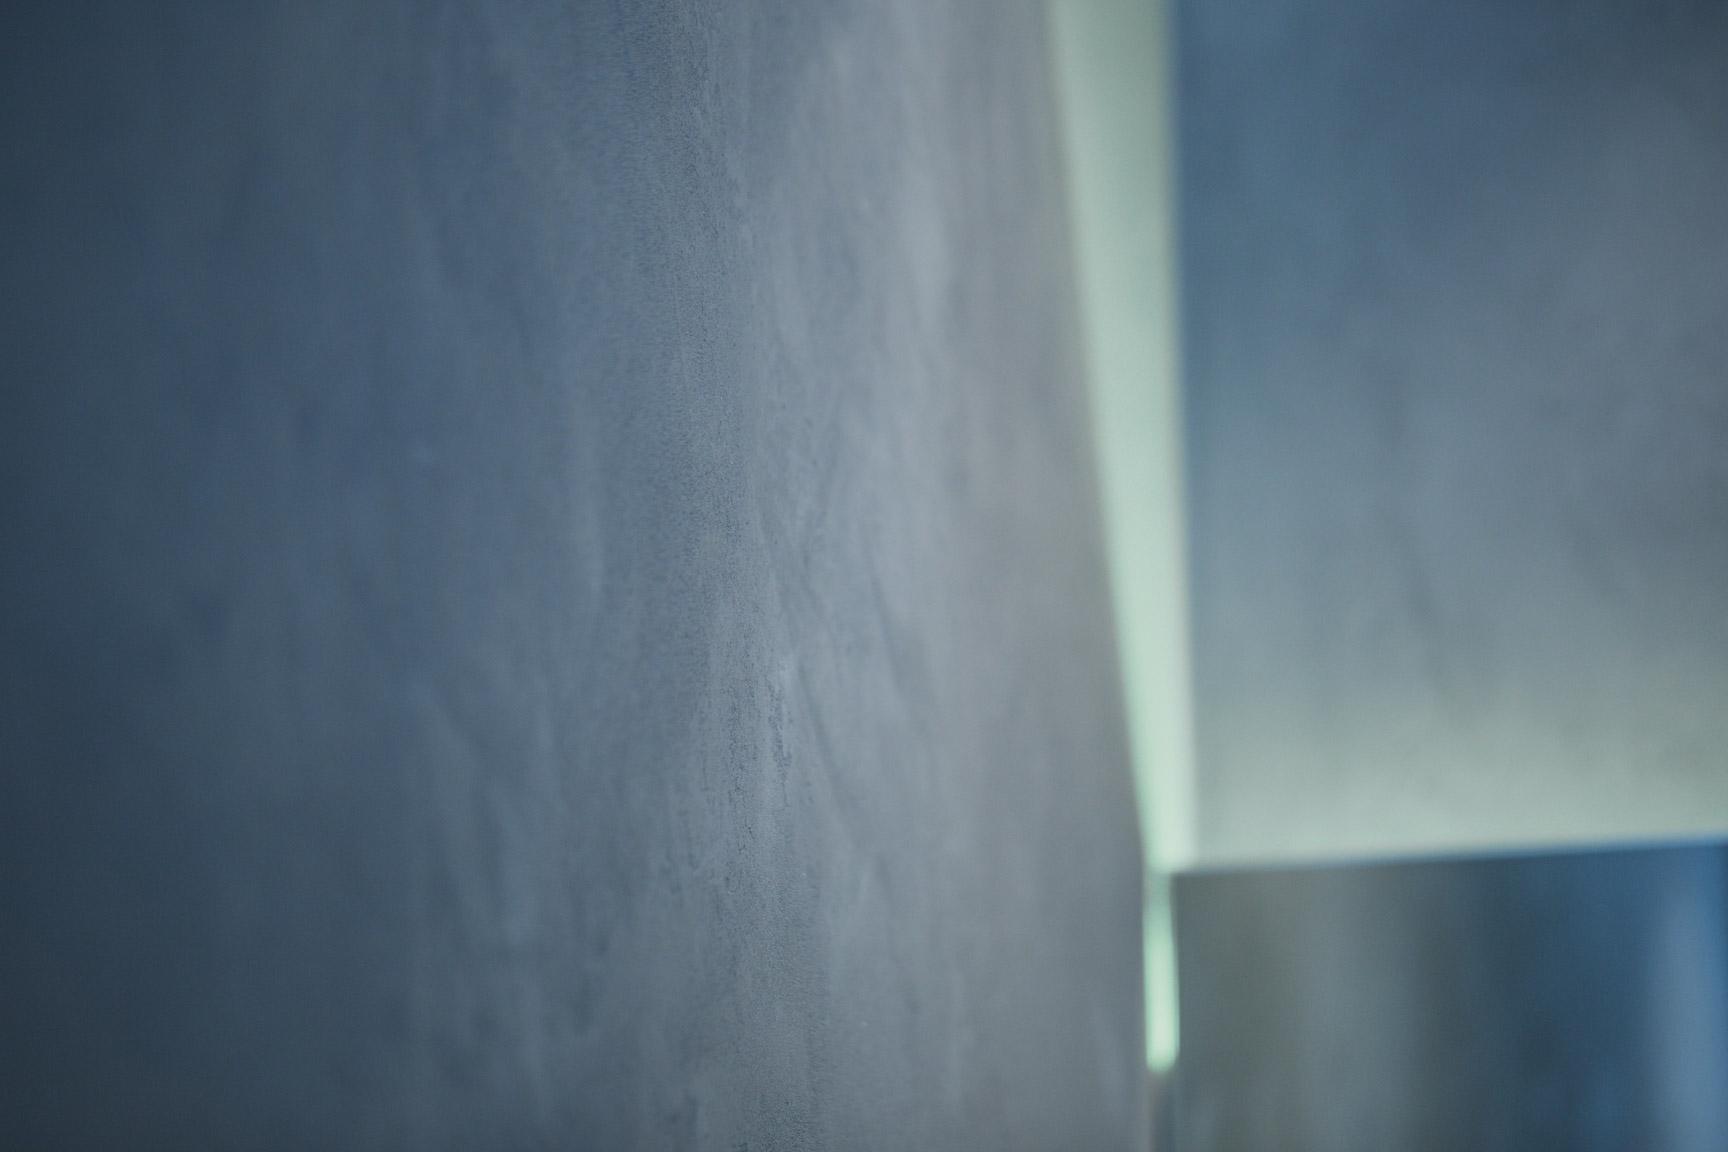 surfacedesign-13.jpg